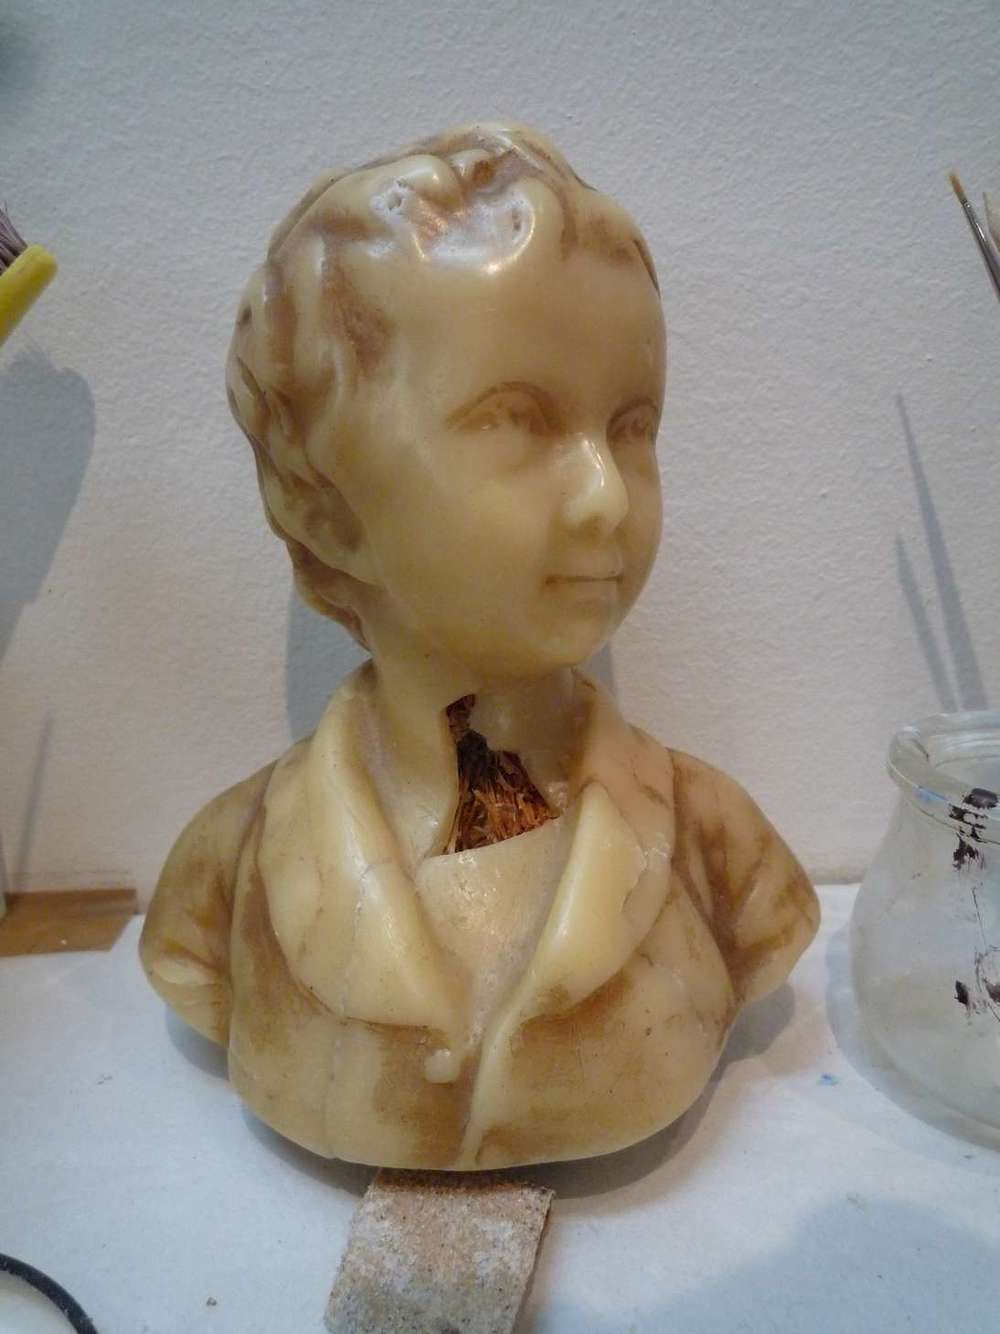 alaxandre-brongniart-enfant-buste-sculpte-cire-socle-bois-art-restauration-reparation-restaurarte.jpg